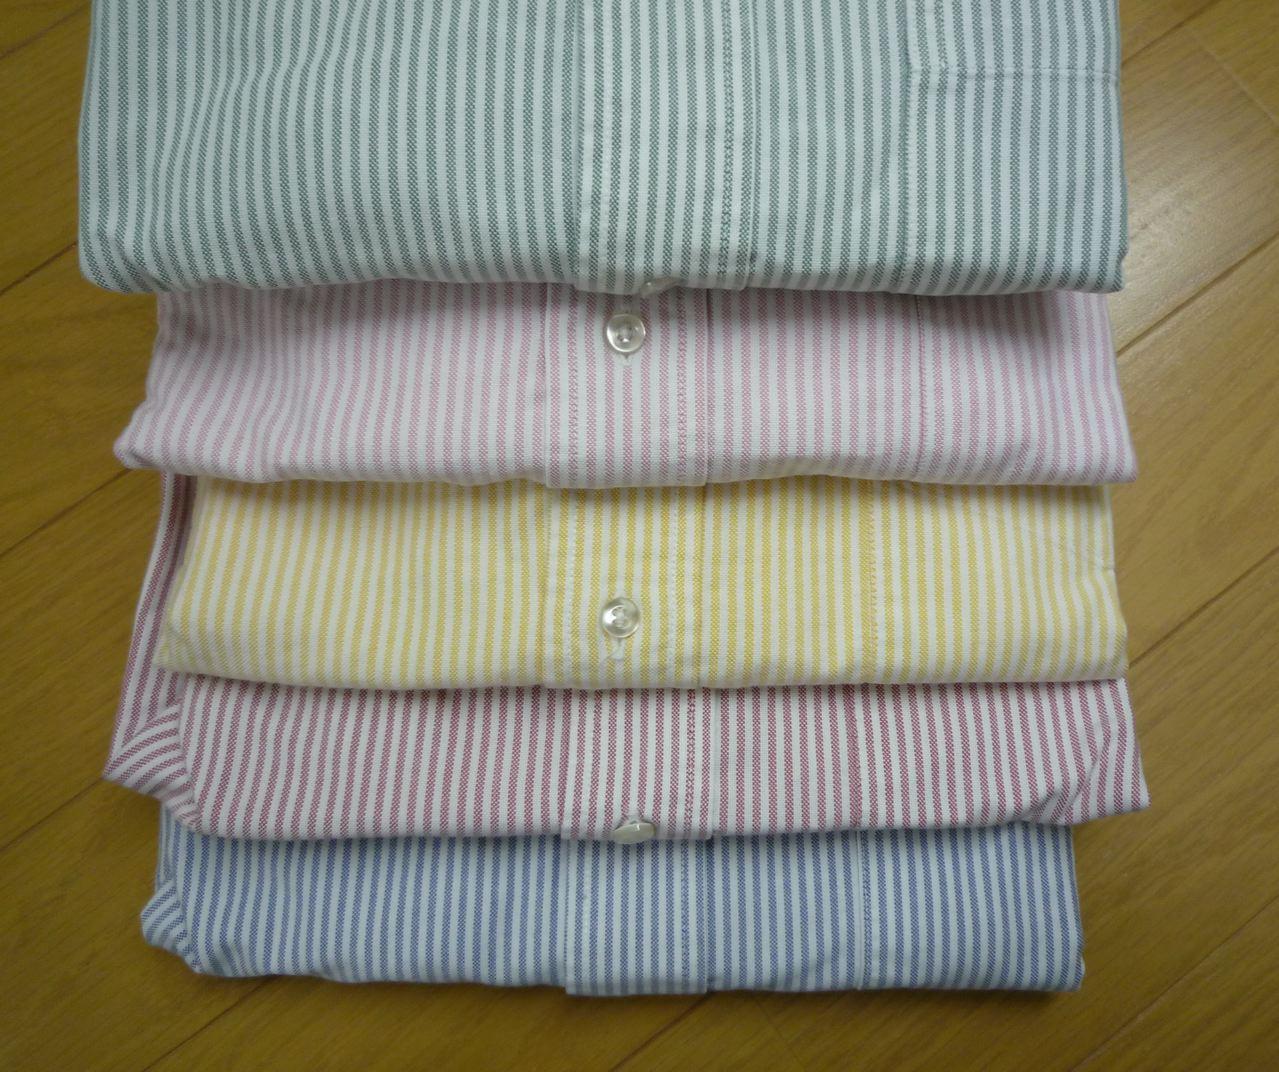 http://4.bp.blogspot.com/_aUE6s--Cm-A/TScTuLEOR8I/AAAAAAAAGrI/ZKfd02npXS8/s1600/BB_AtticShirts_b.jpg